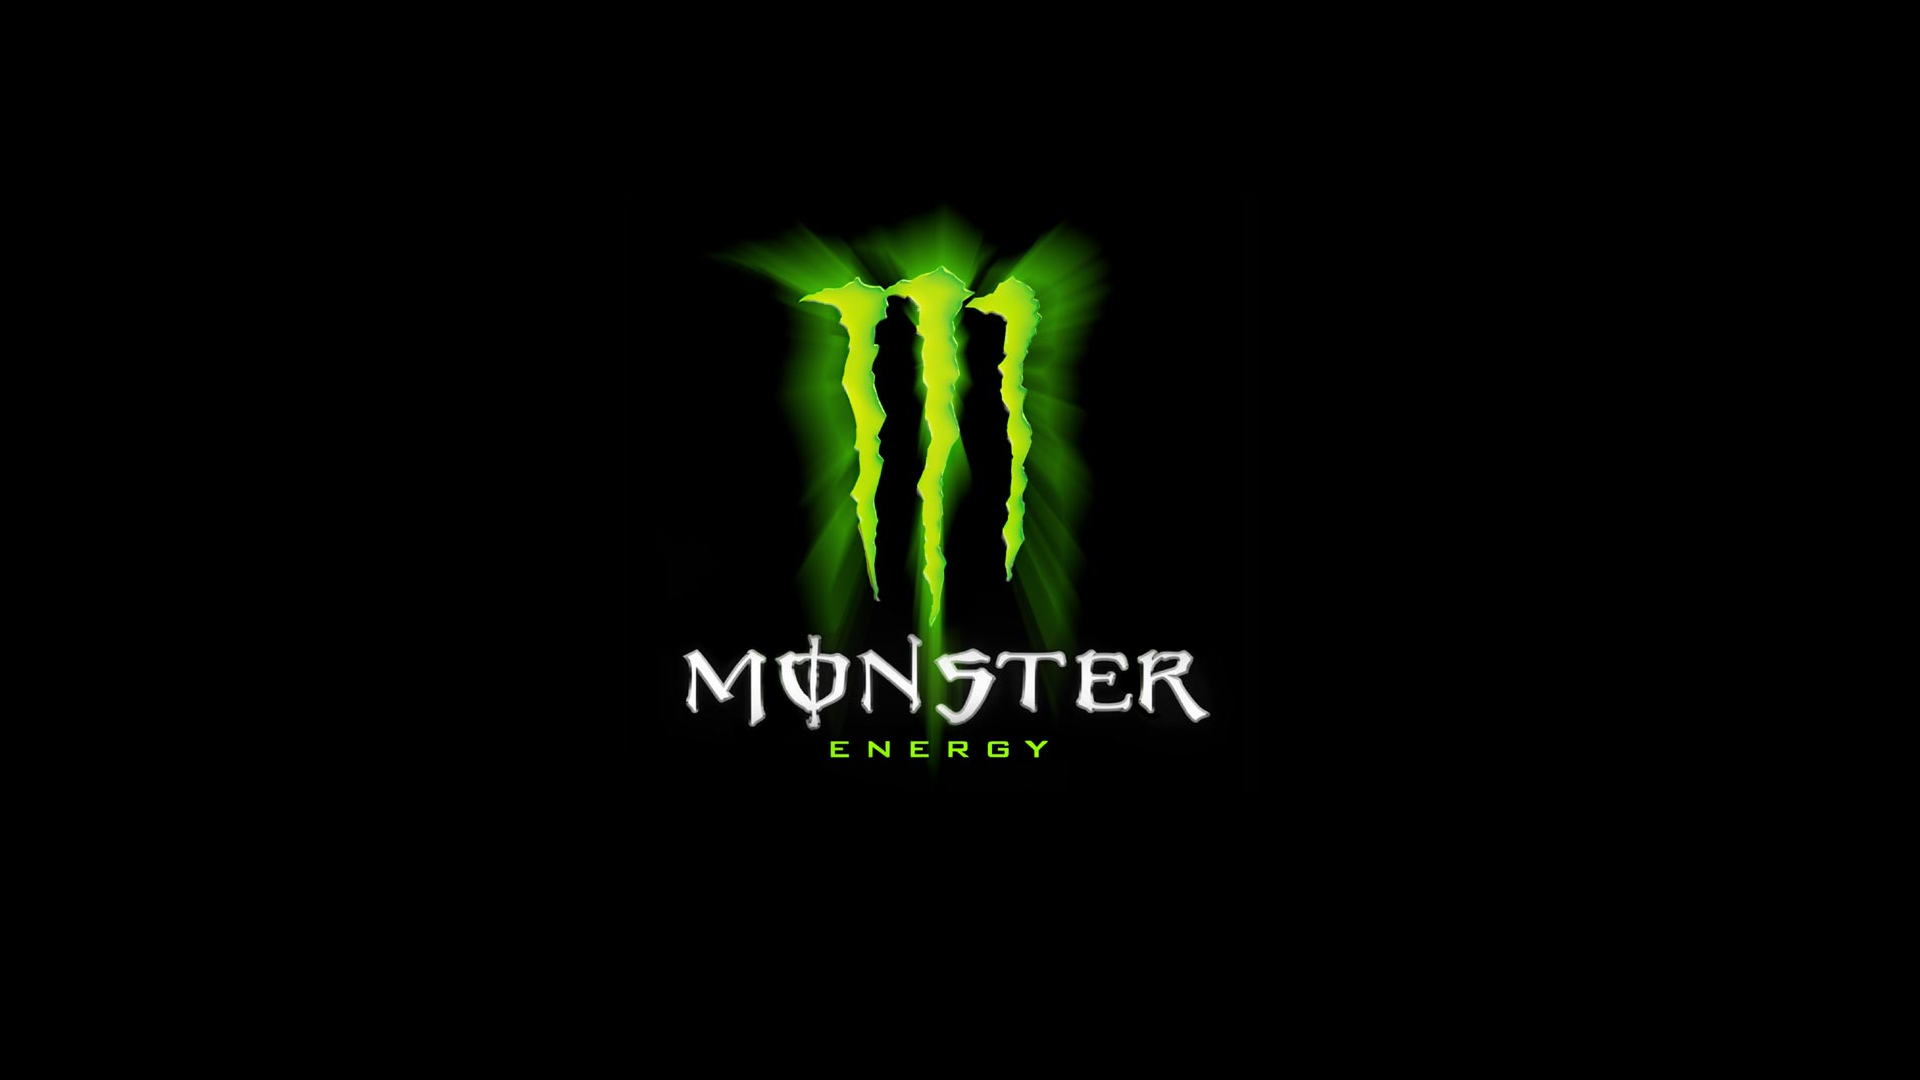 Monster Energy Logo Wallpaper Wallpupcom 1920x1080